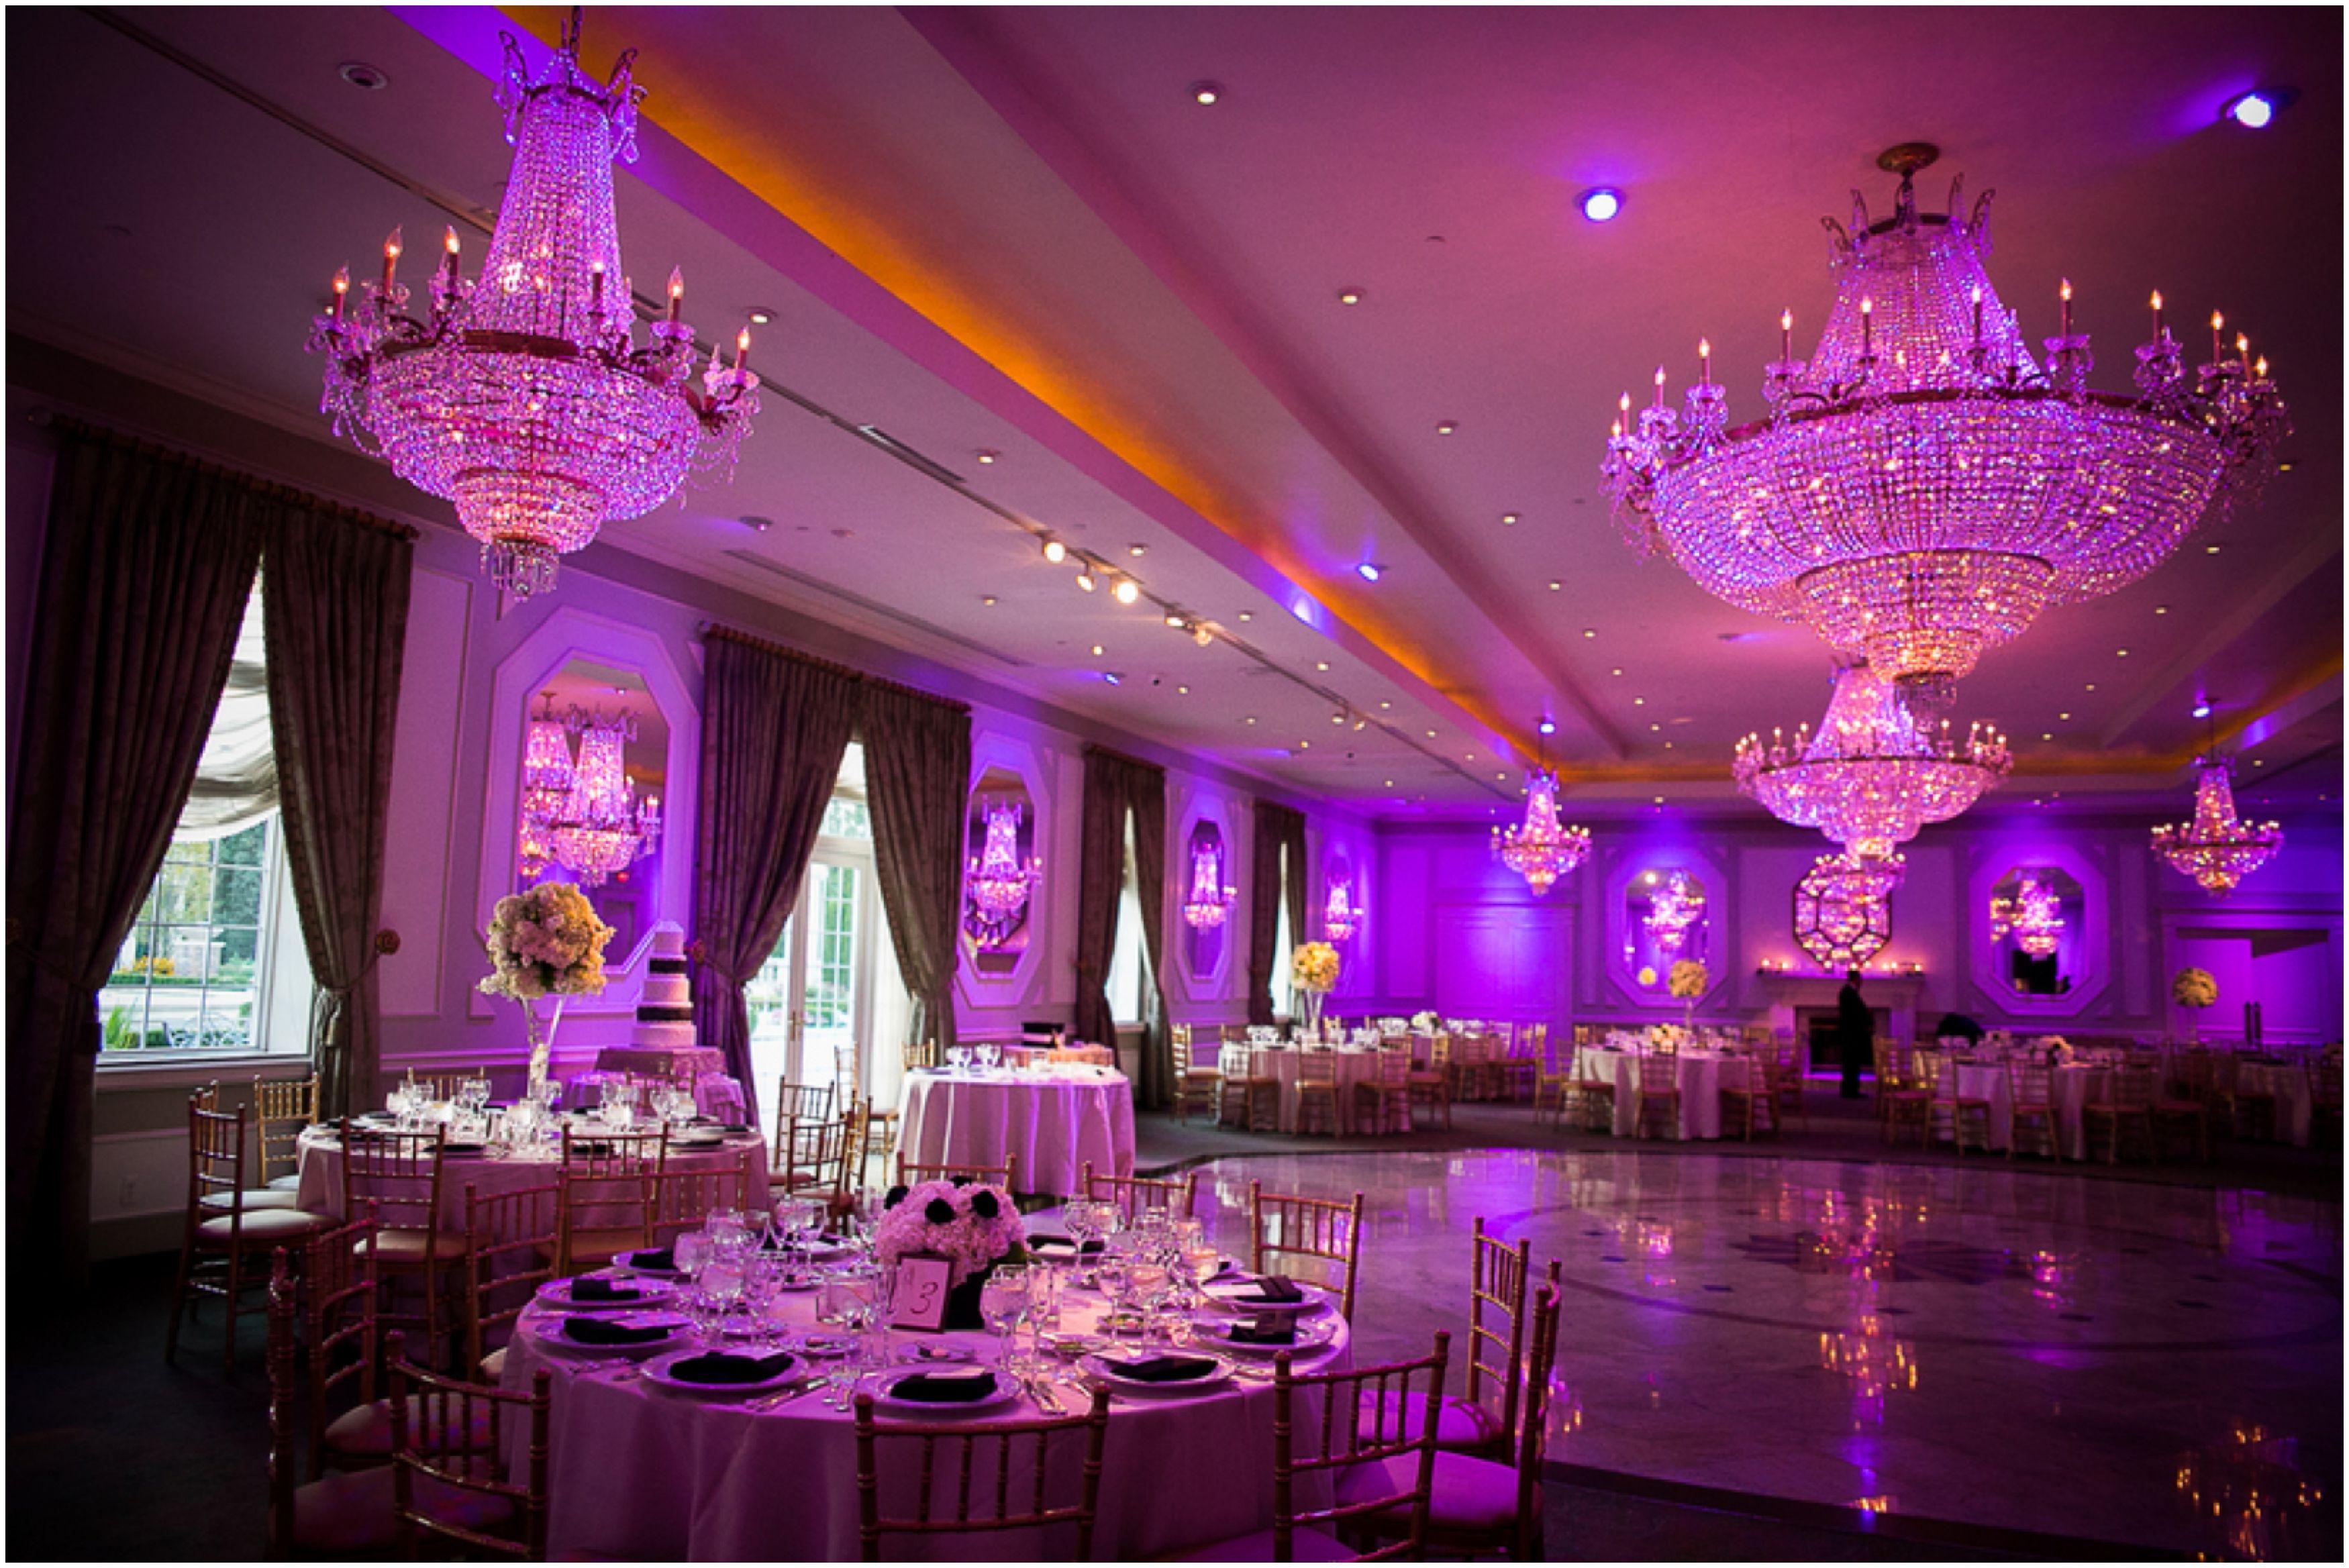 church wedding decorations purple black white wedding ideas Best